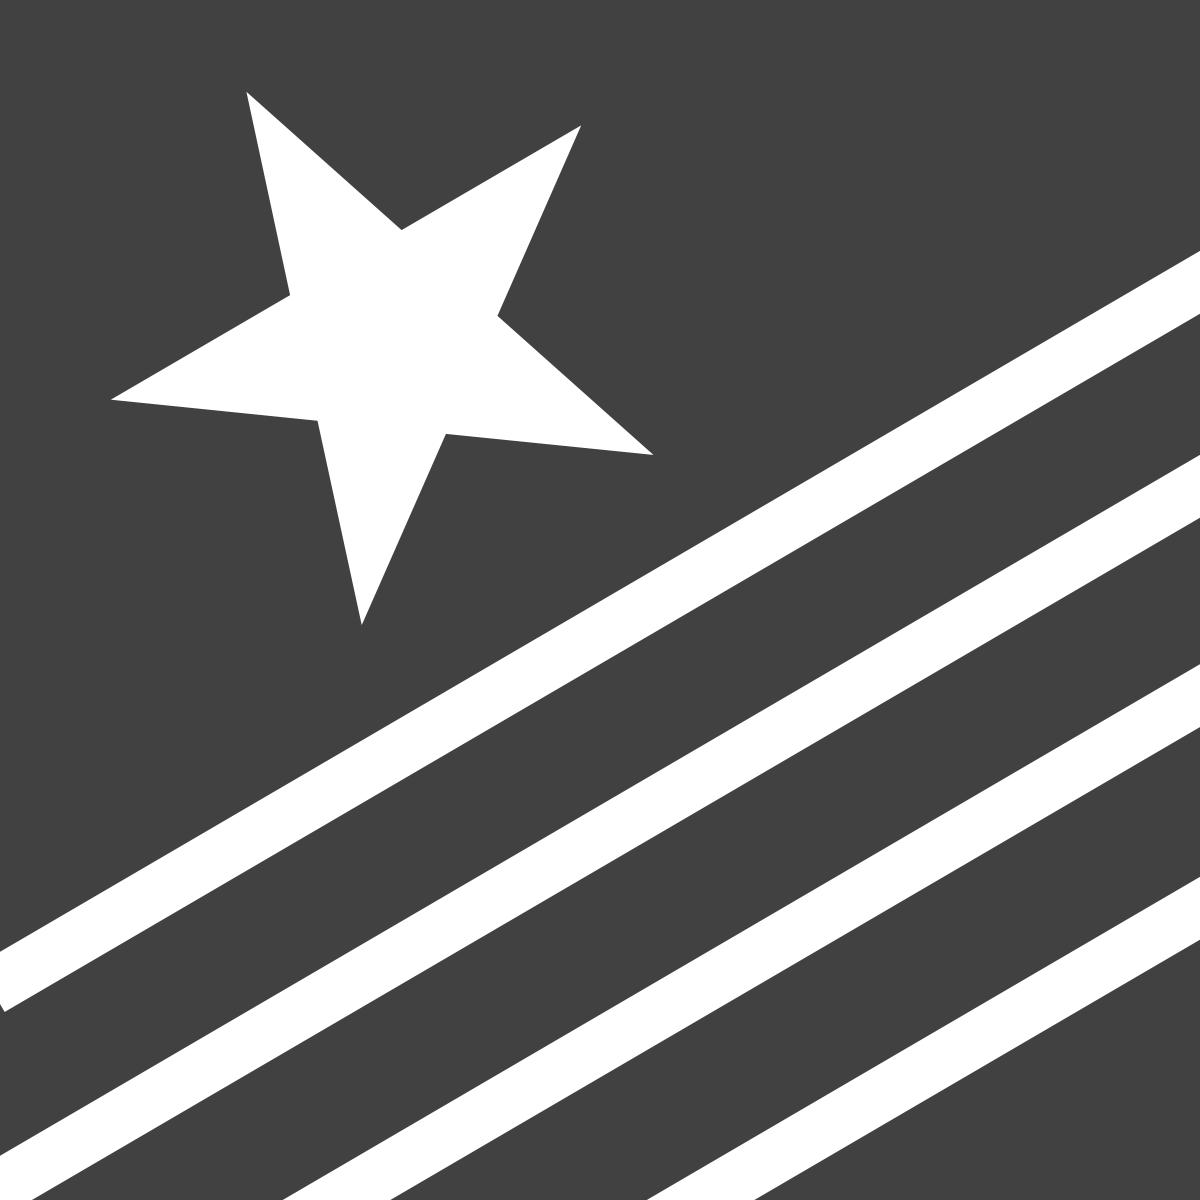 USA designation icon